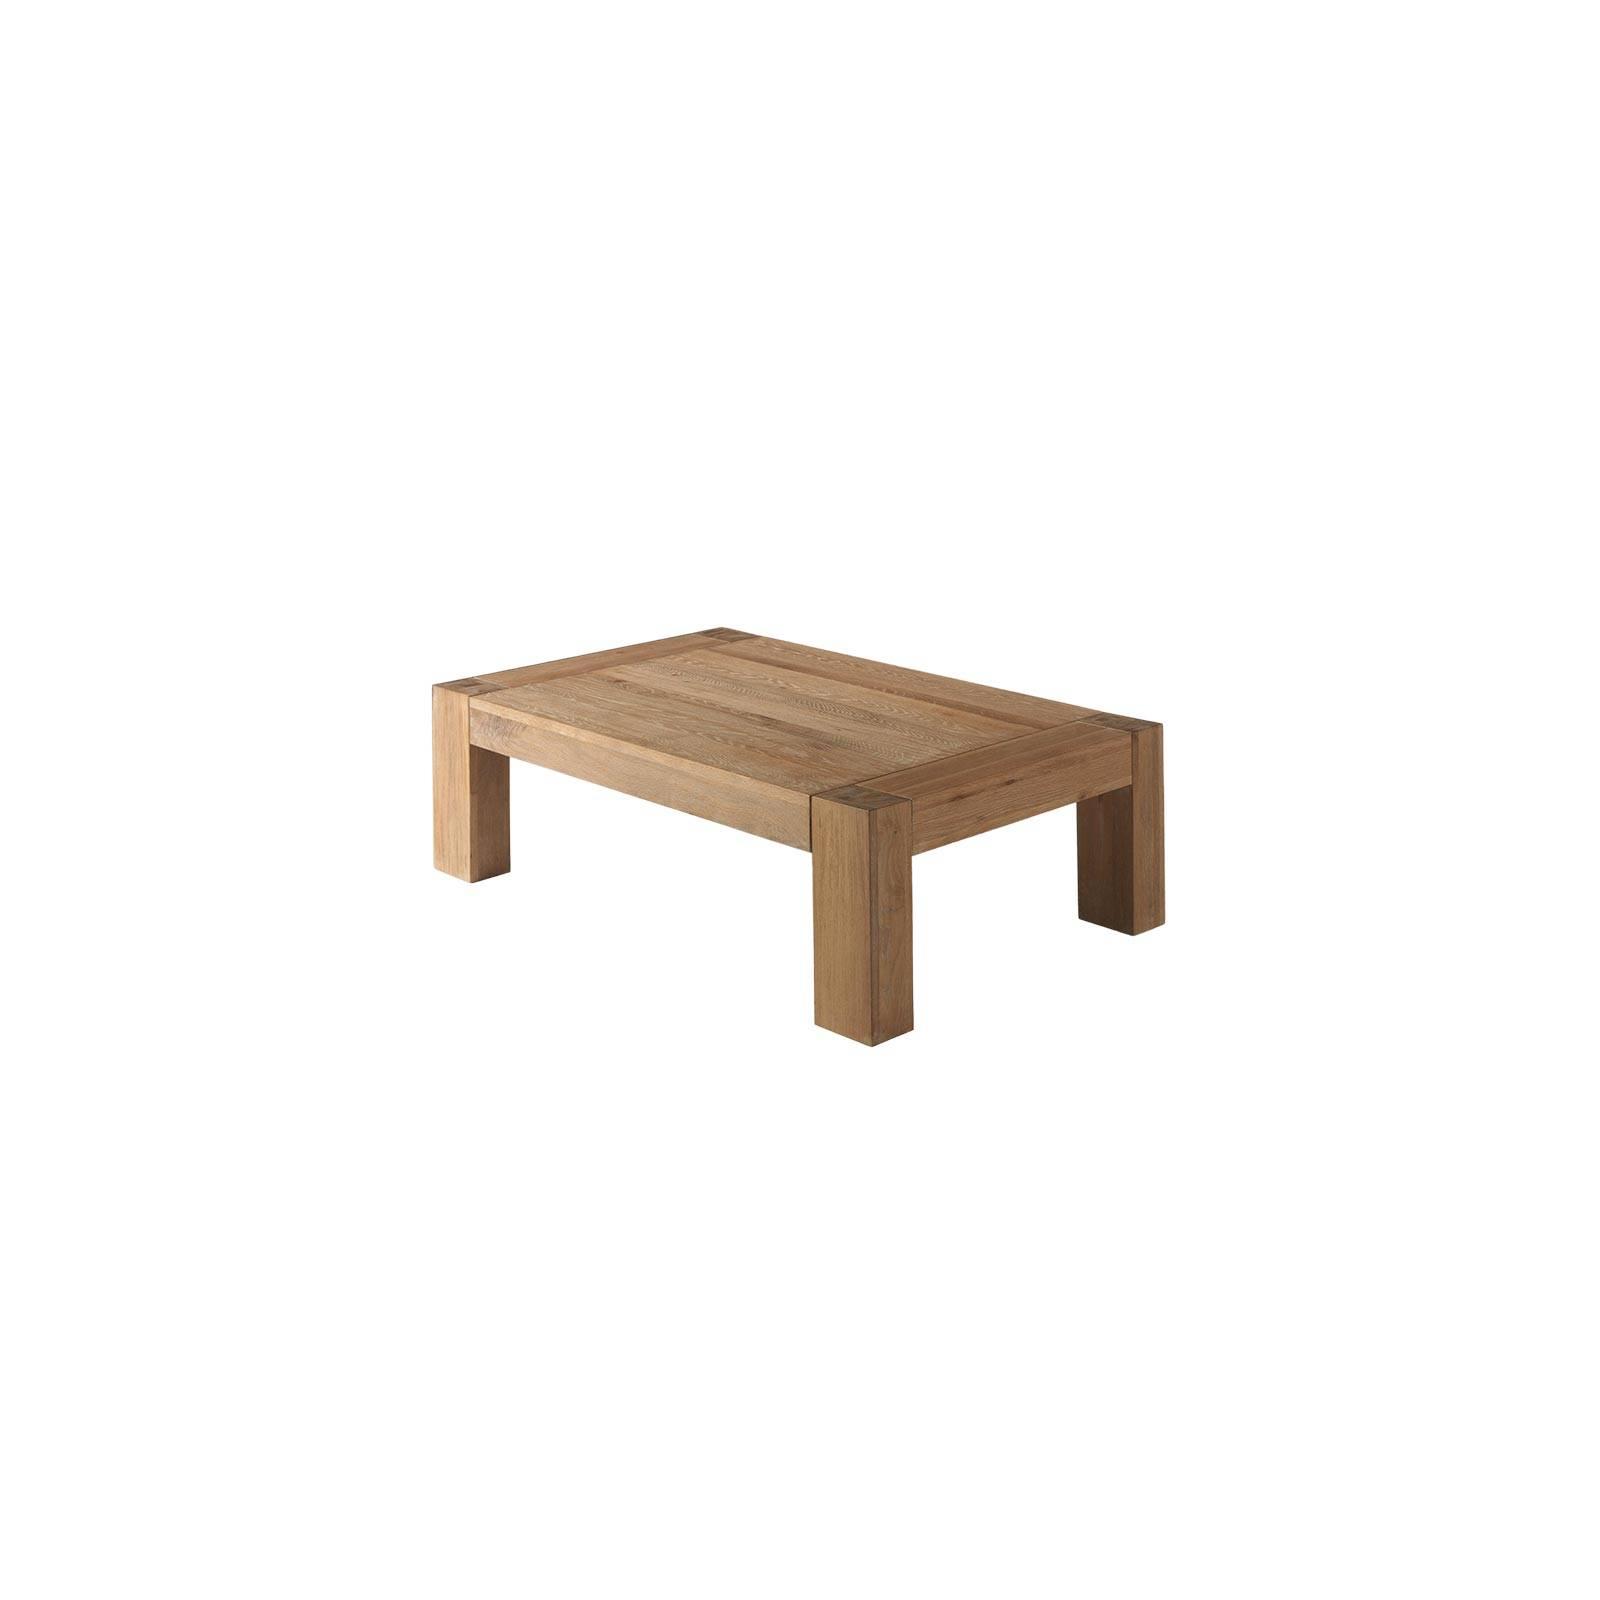 Table Basse Rectangulaire Chêne Massif Zeus